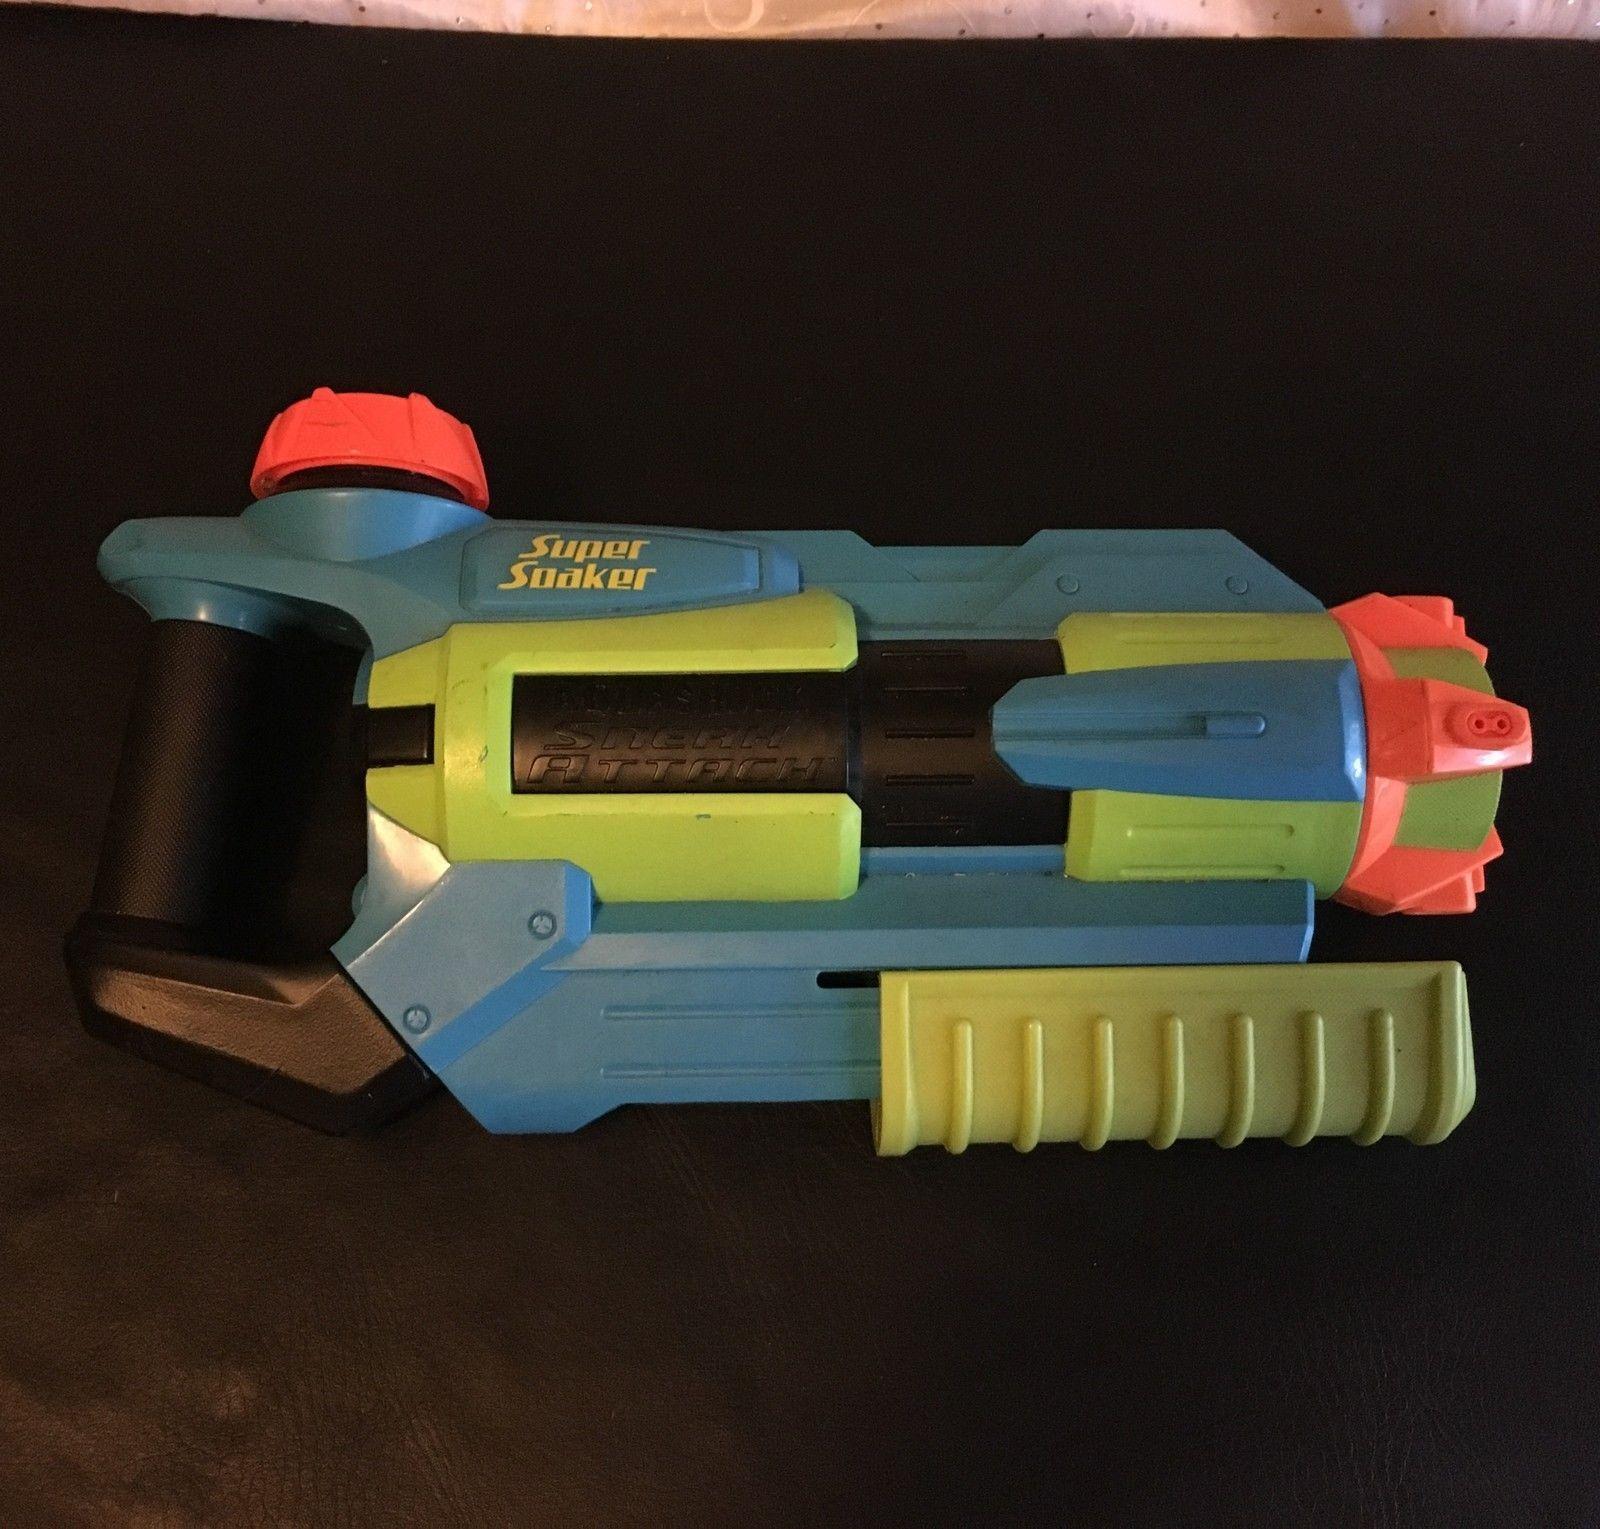 SUPER SOAKER AQUA SHOCK AQUASHOCK WATER BLASTER GUN SNEAK ATTACK 4 WAY SPRAY - $33.81